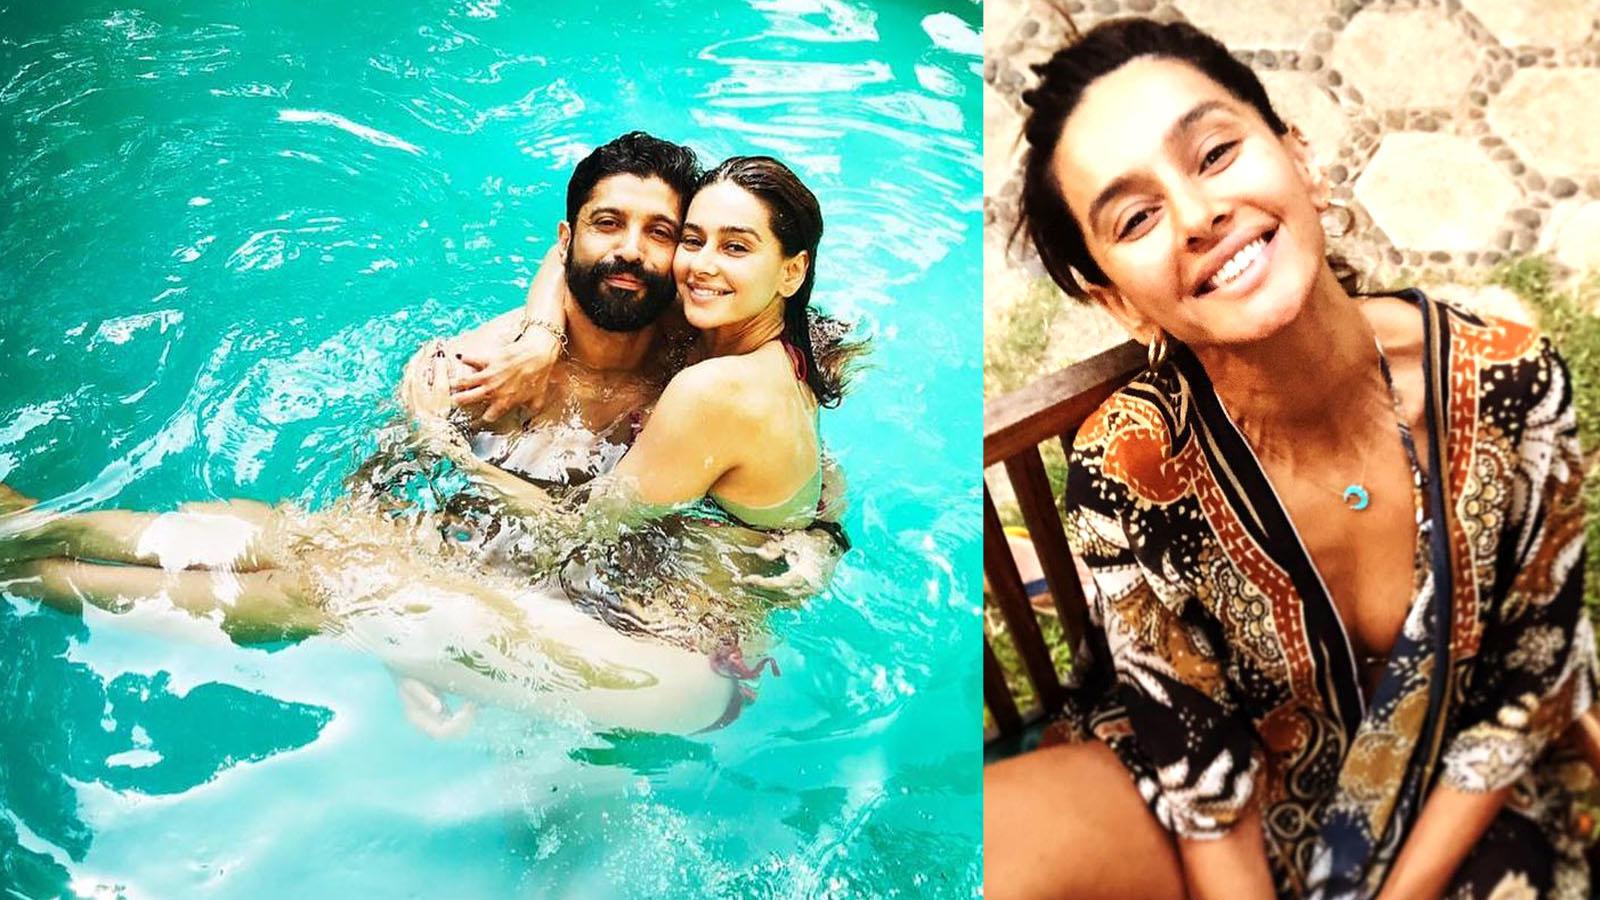 Farhan Akhtar shares adorable birthday post for girlfriend Shibani Dandekar with a cryptic twist